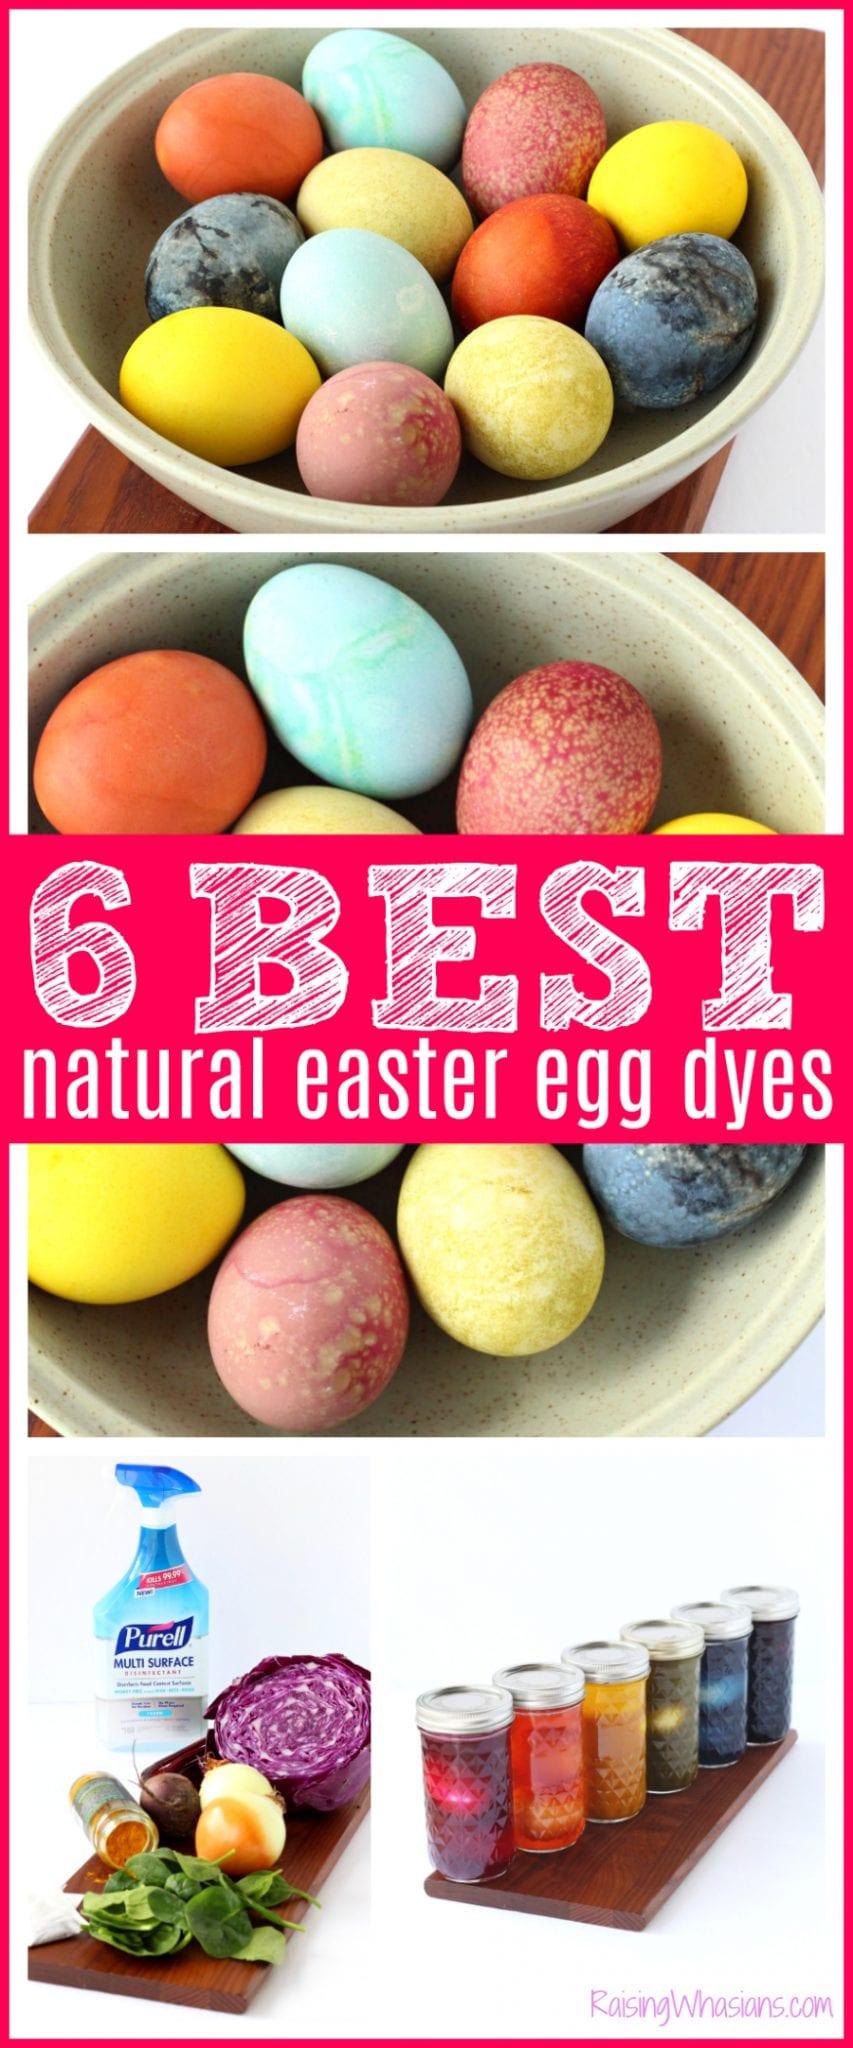 Best all natural egg dyes